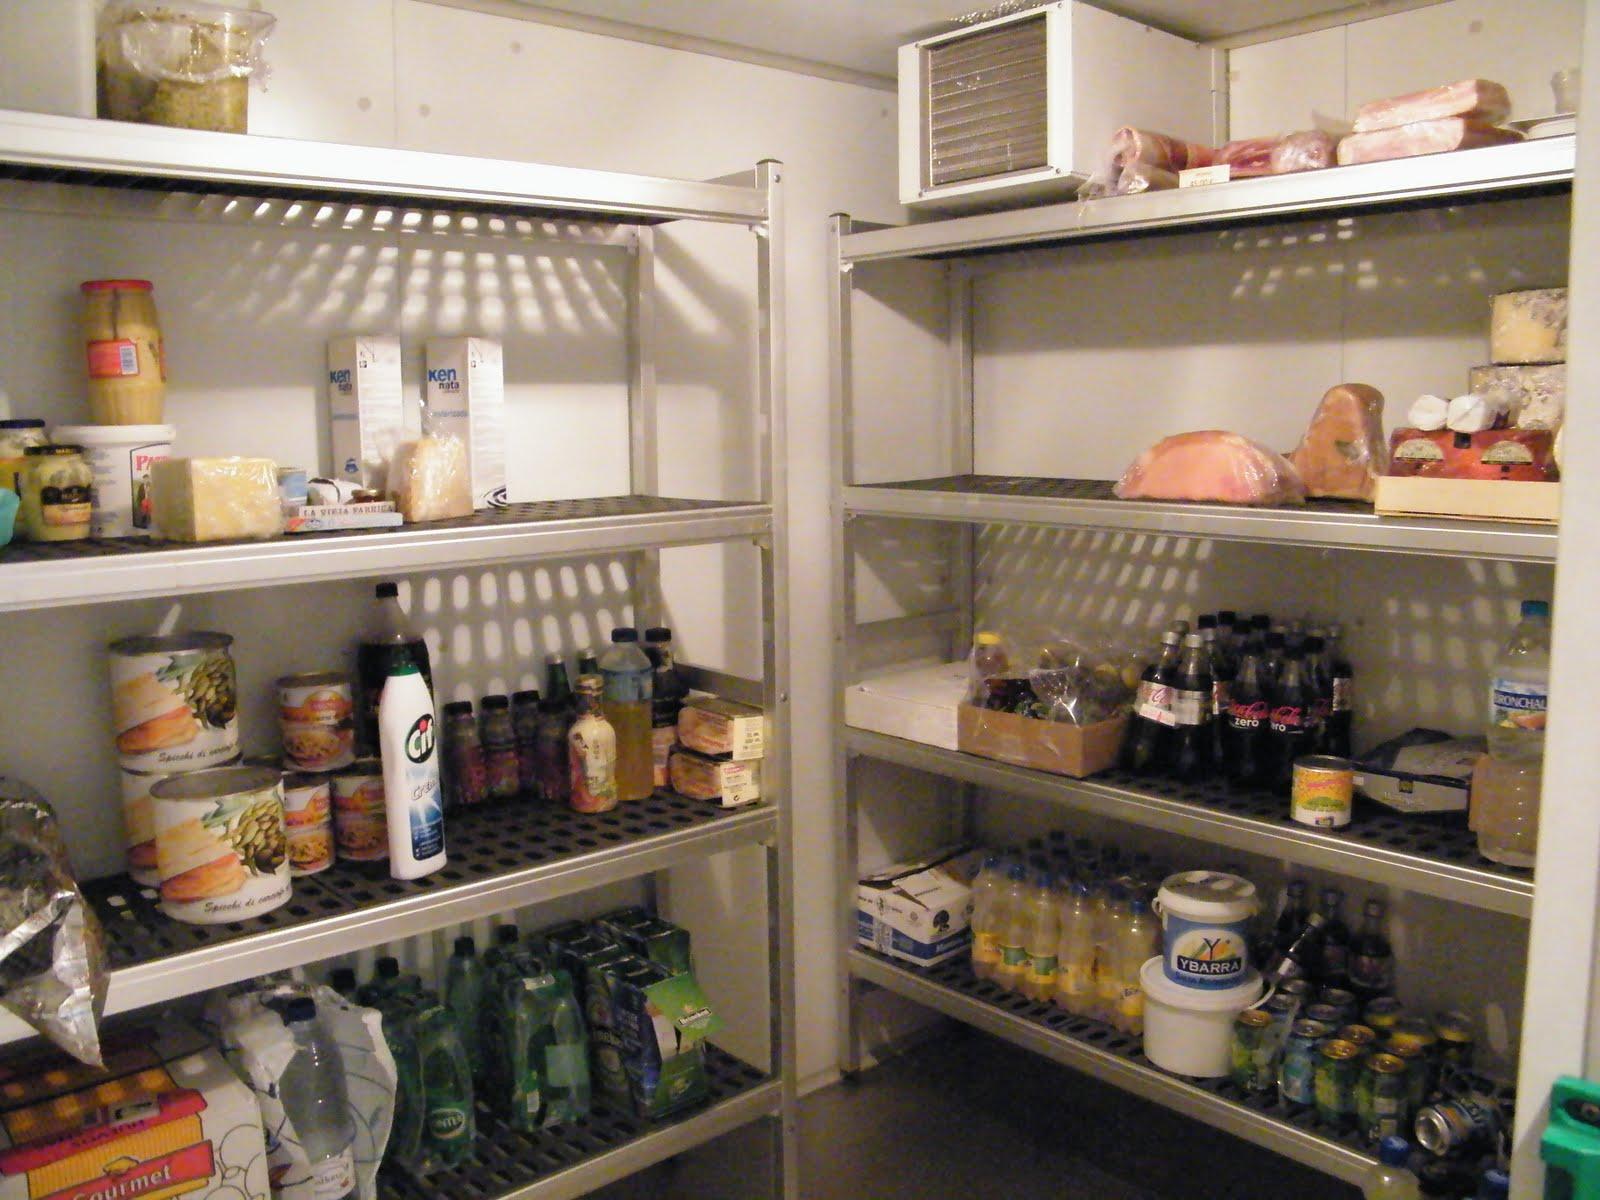 Venta material hosteleria segunda mano camara frigorifica for Material cocina segunda mano